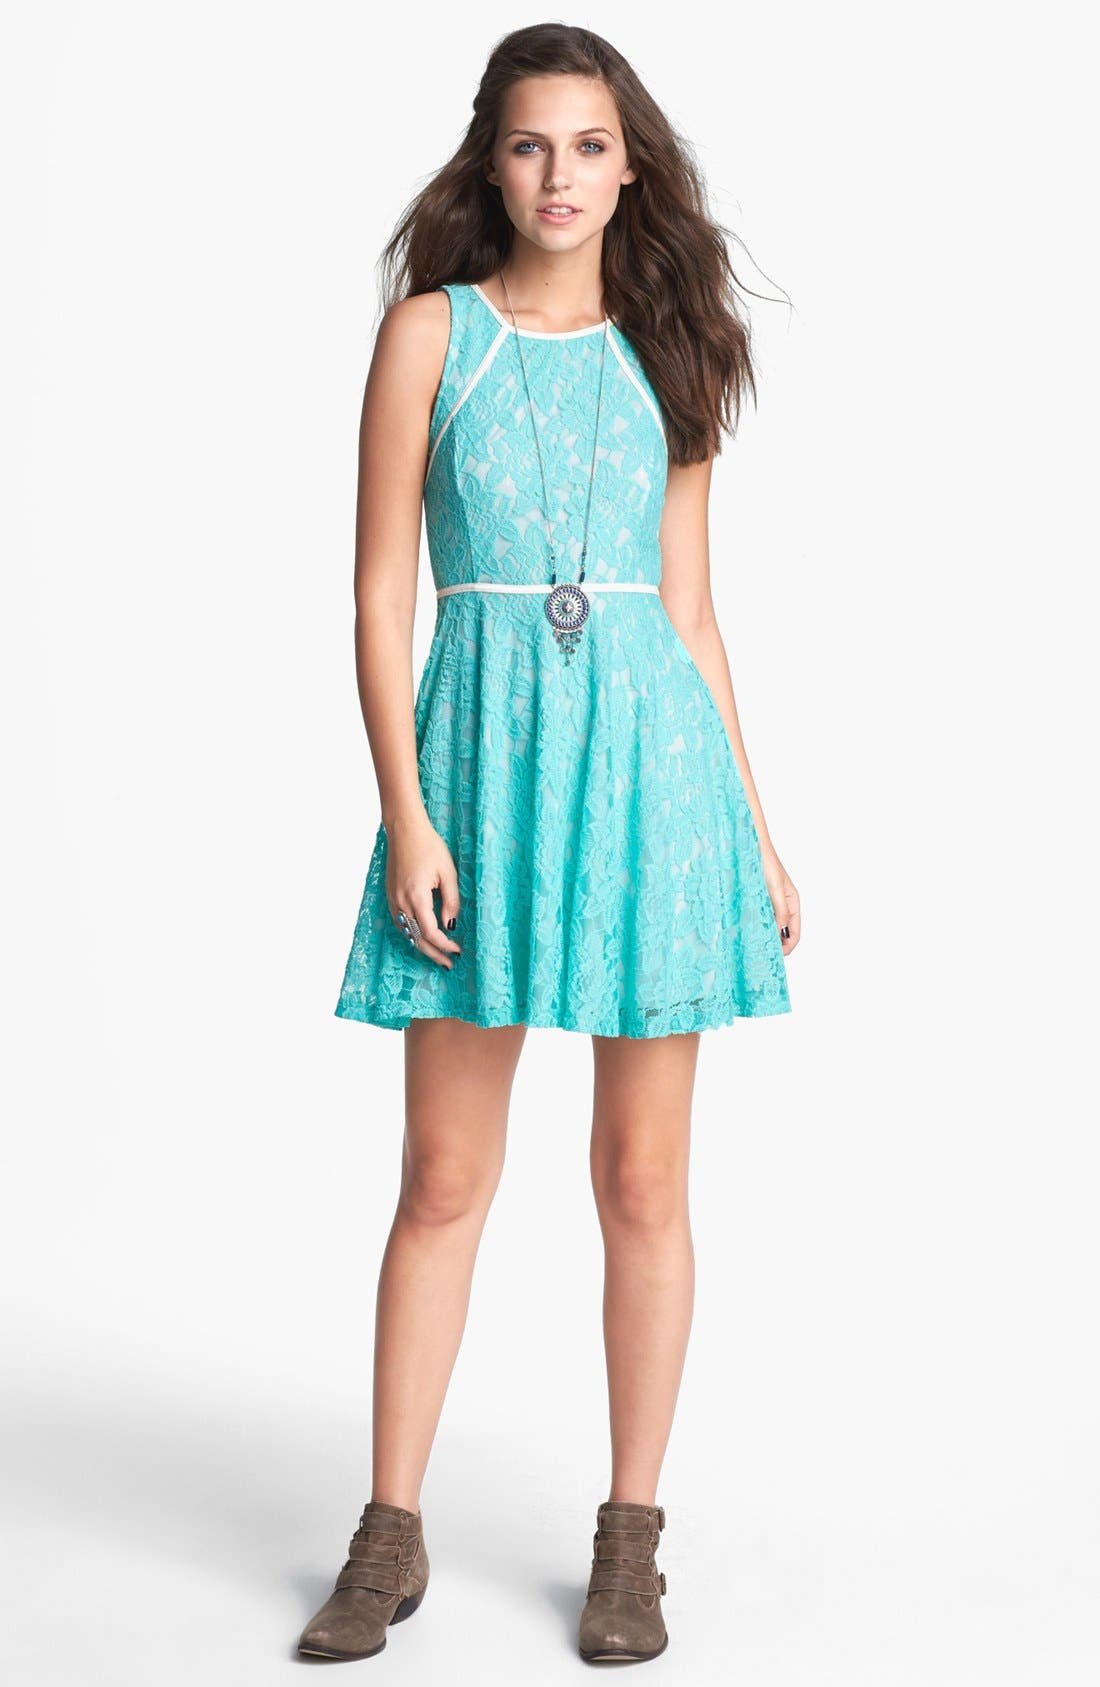 Main Image - Lush Faux Leather Trim Lace Skater Dress (Juniors)